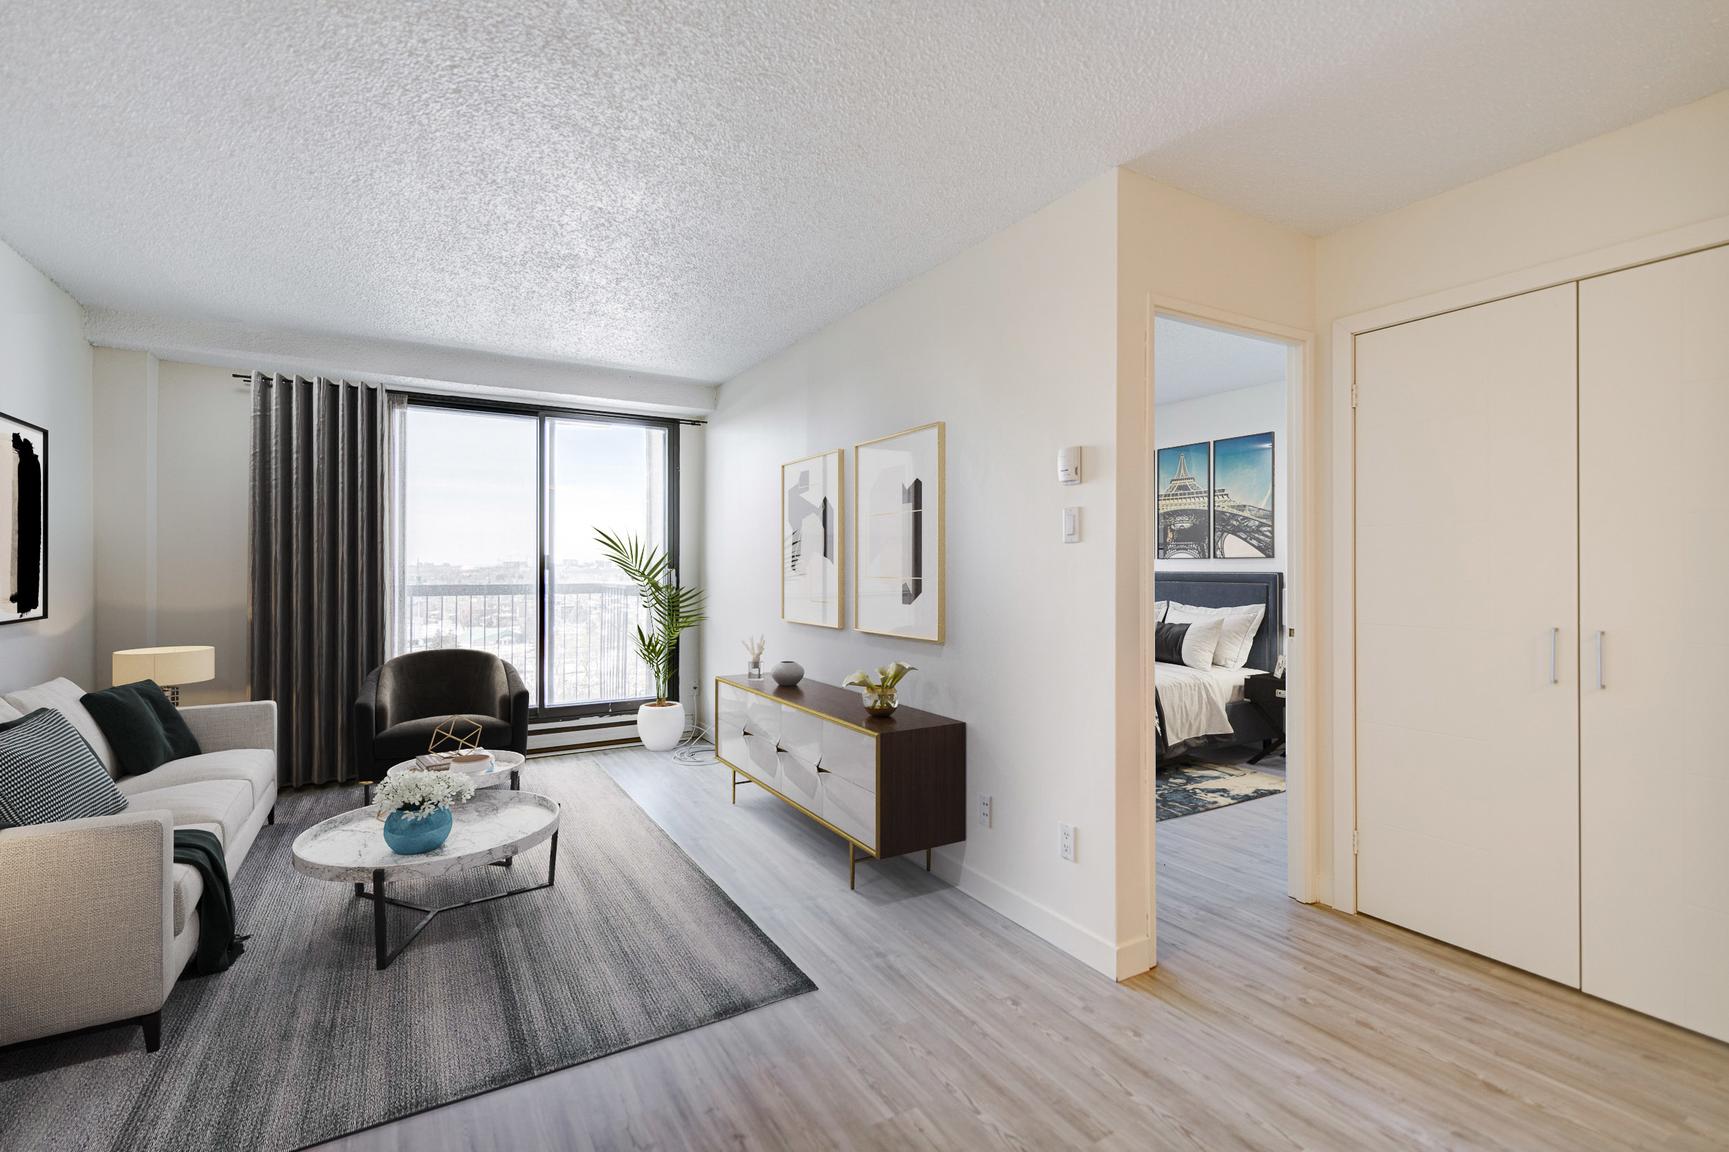 2 bedroom Apartments for rent in Laval at Le Quatre Cent - Photo 02 - RentQuebecApartments – L407185